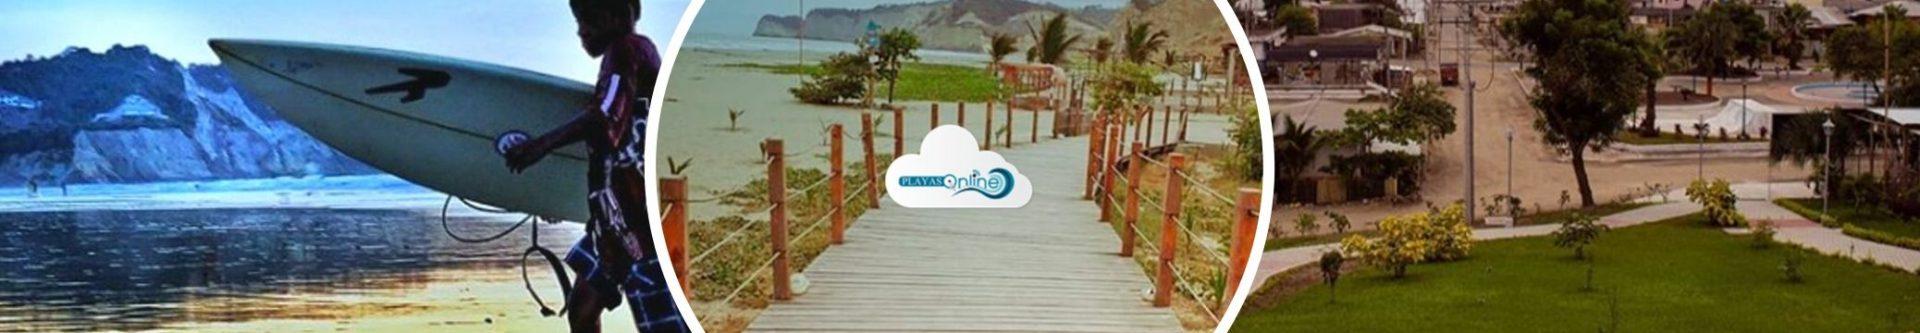 Playa de Canoa en Manabí, Ecuador